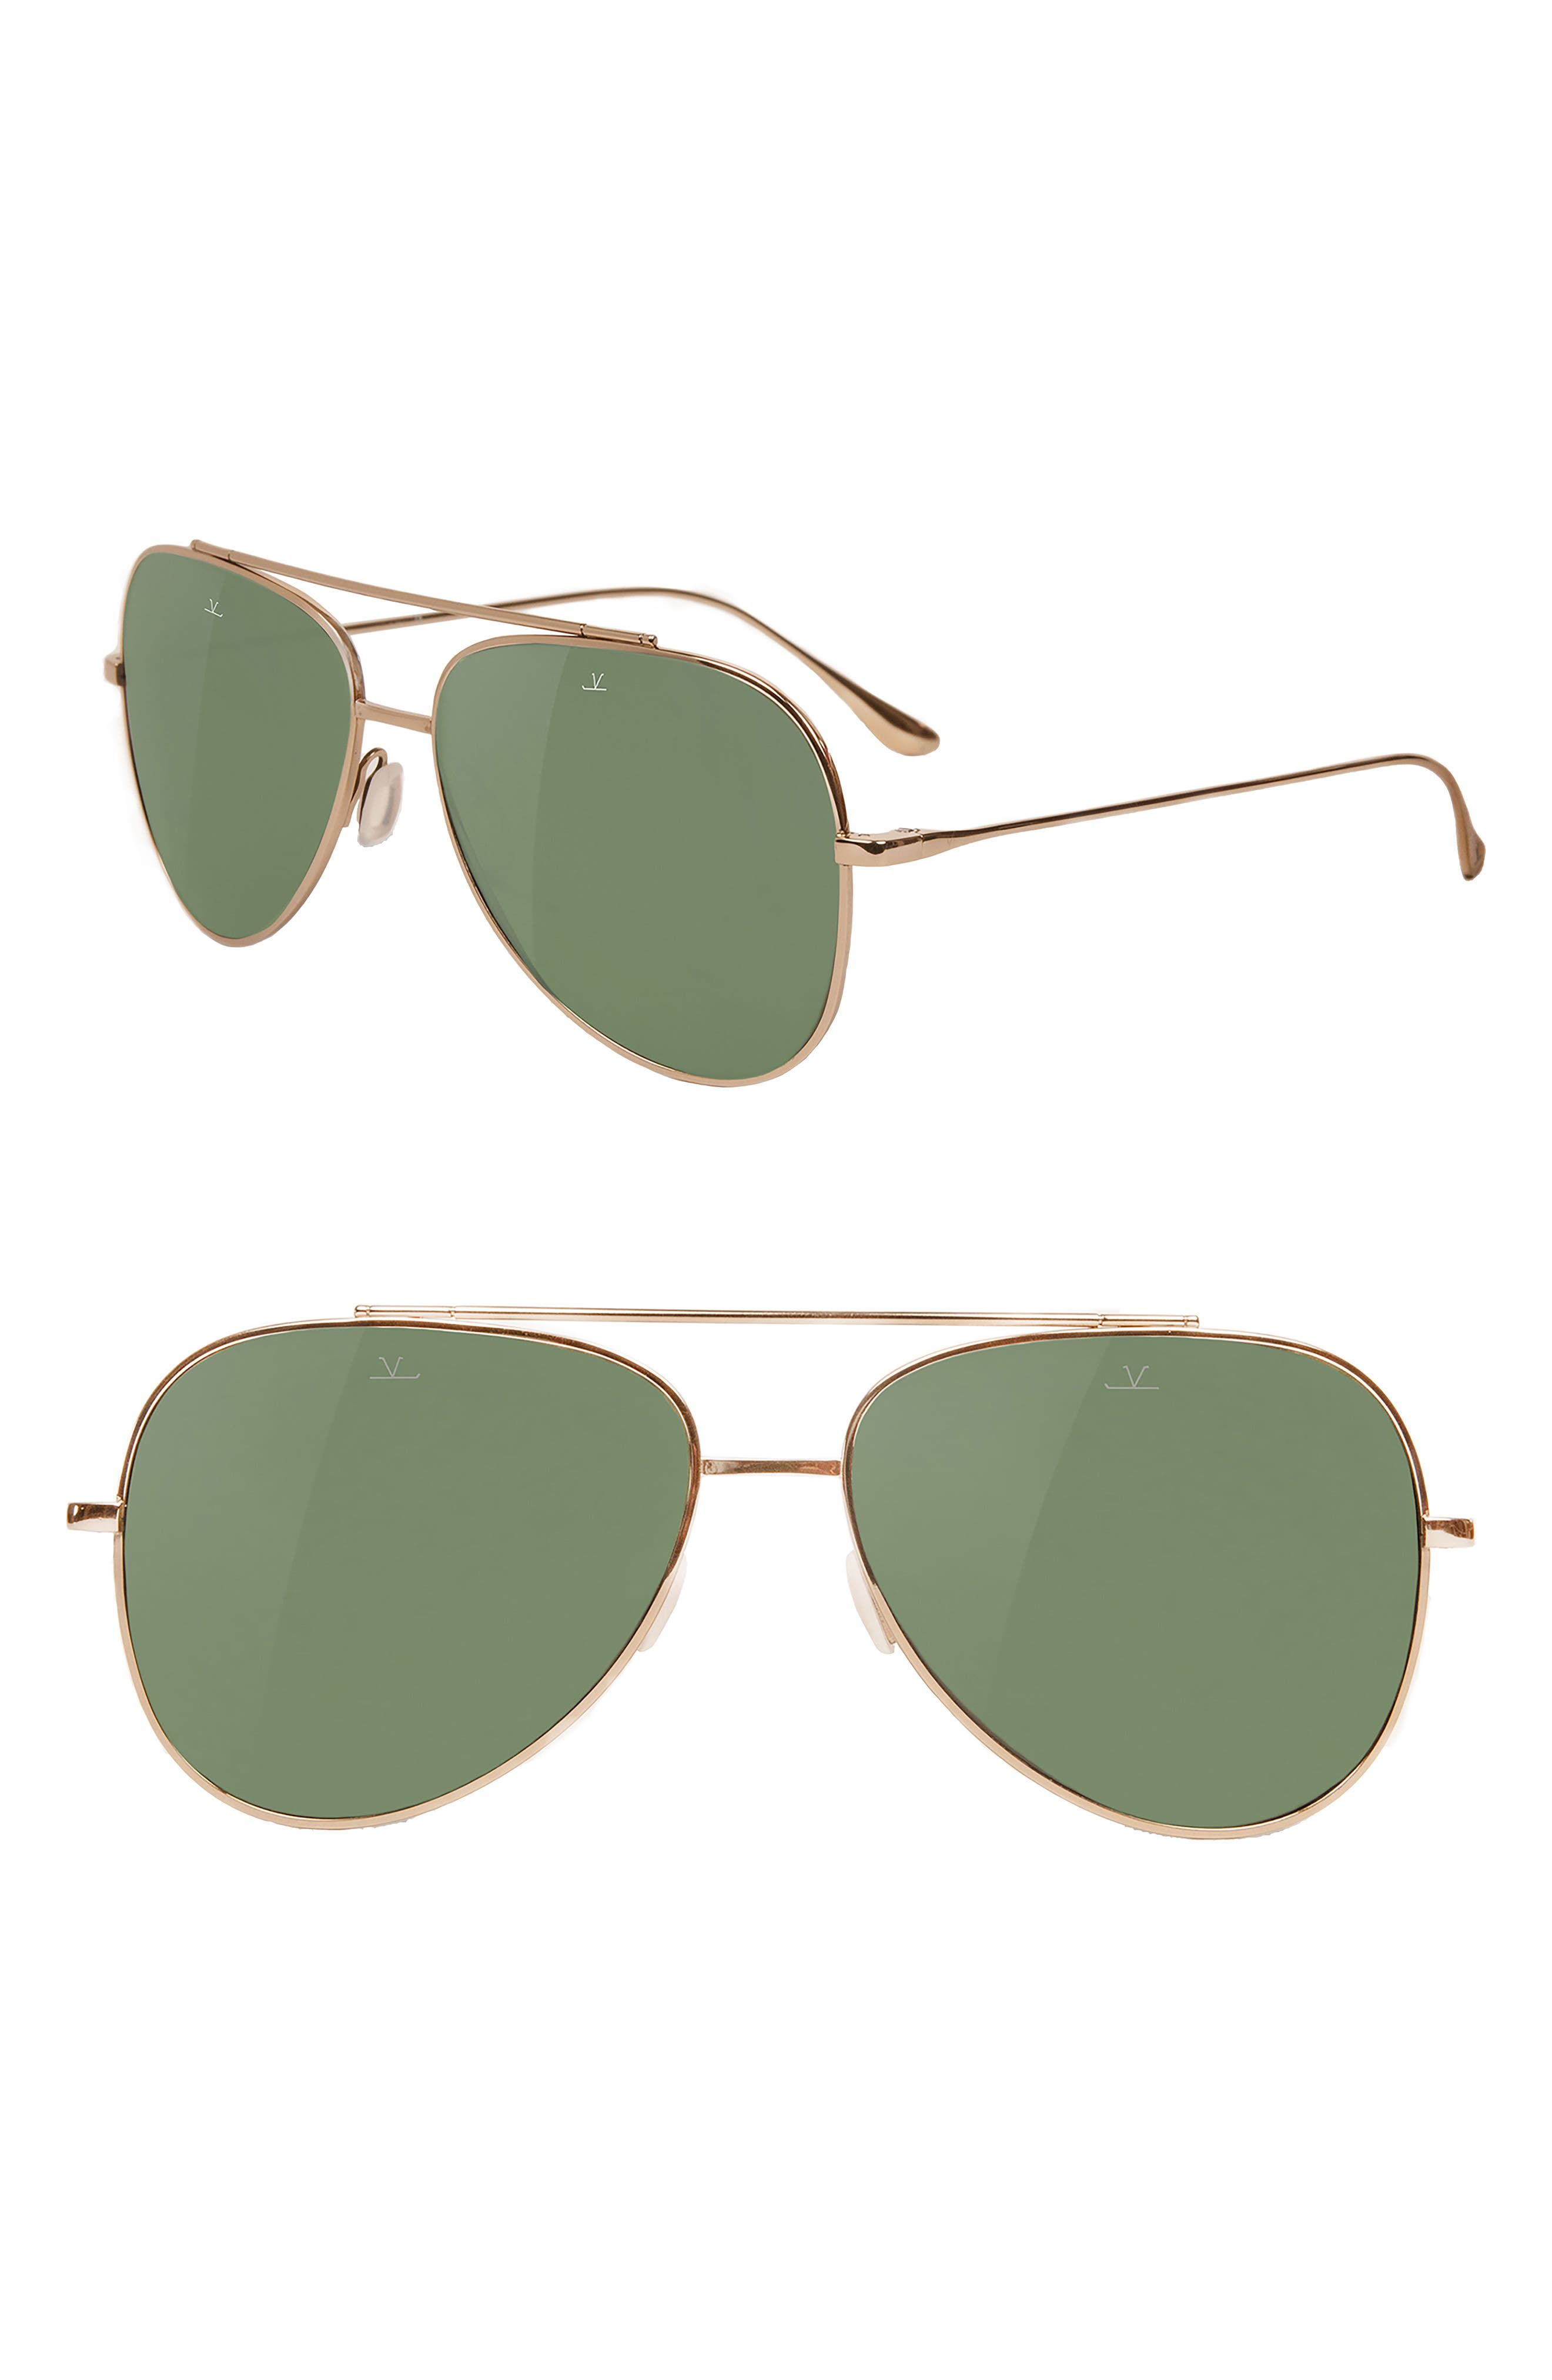 Swing 58mm Aviator Sunglasses,                             Main thumbnail 1, color,                             PURE GREY